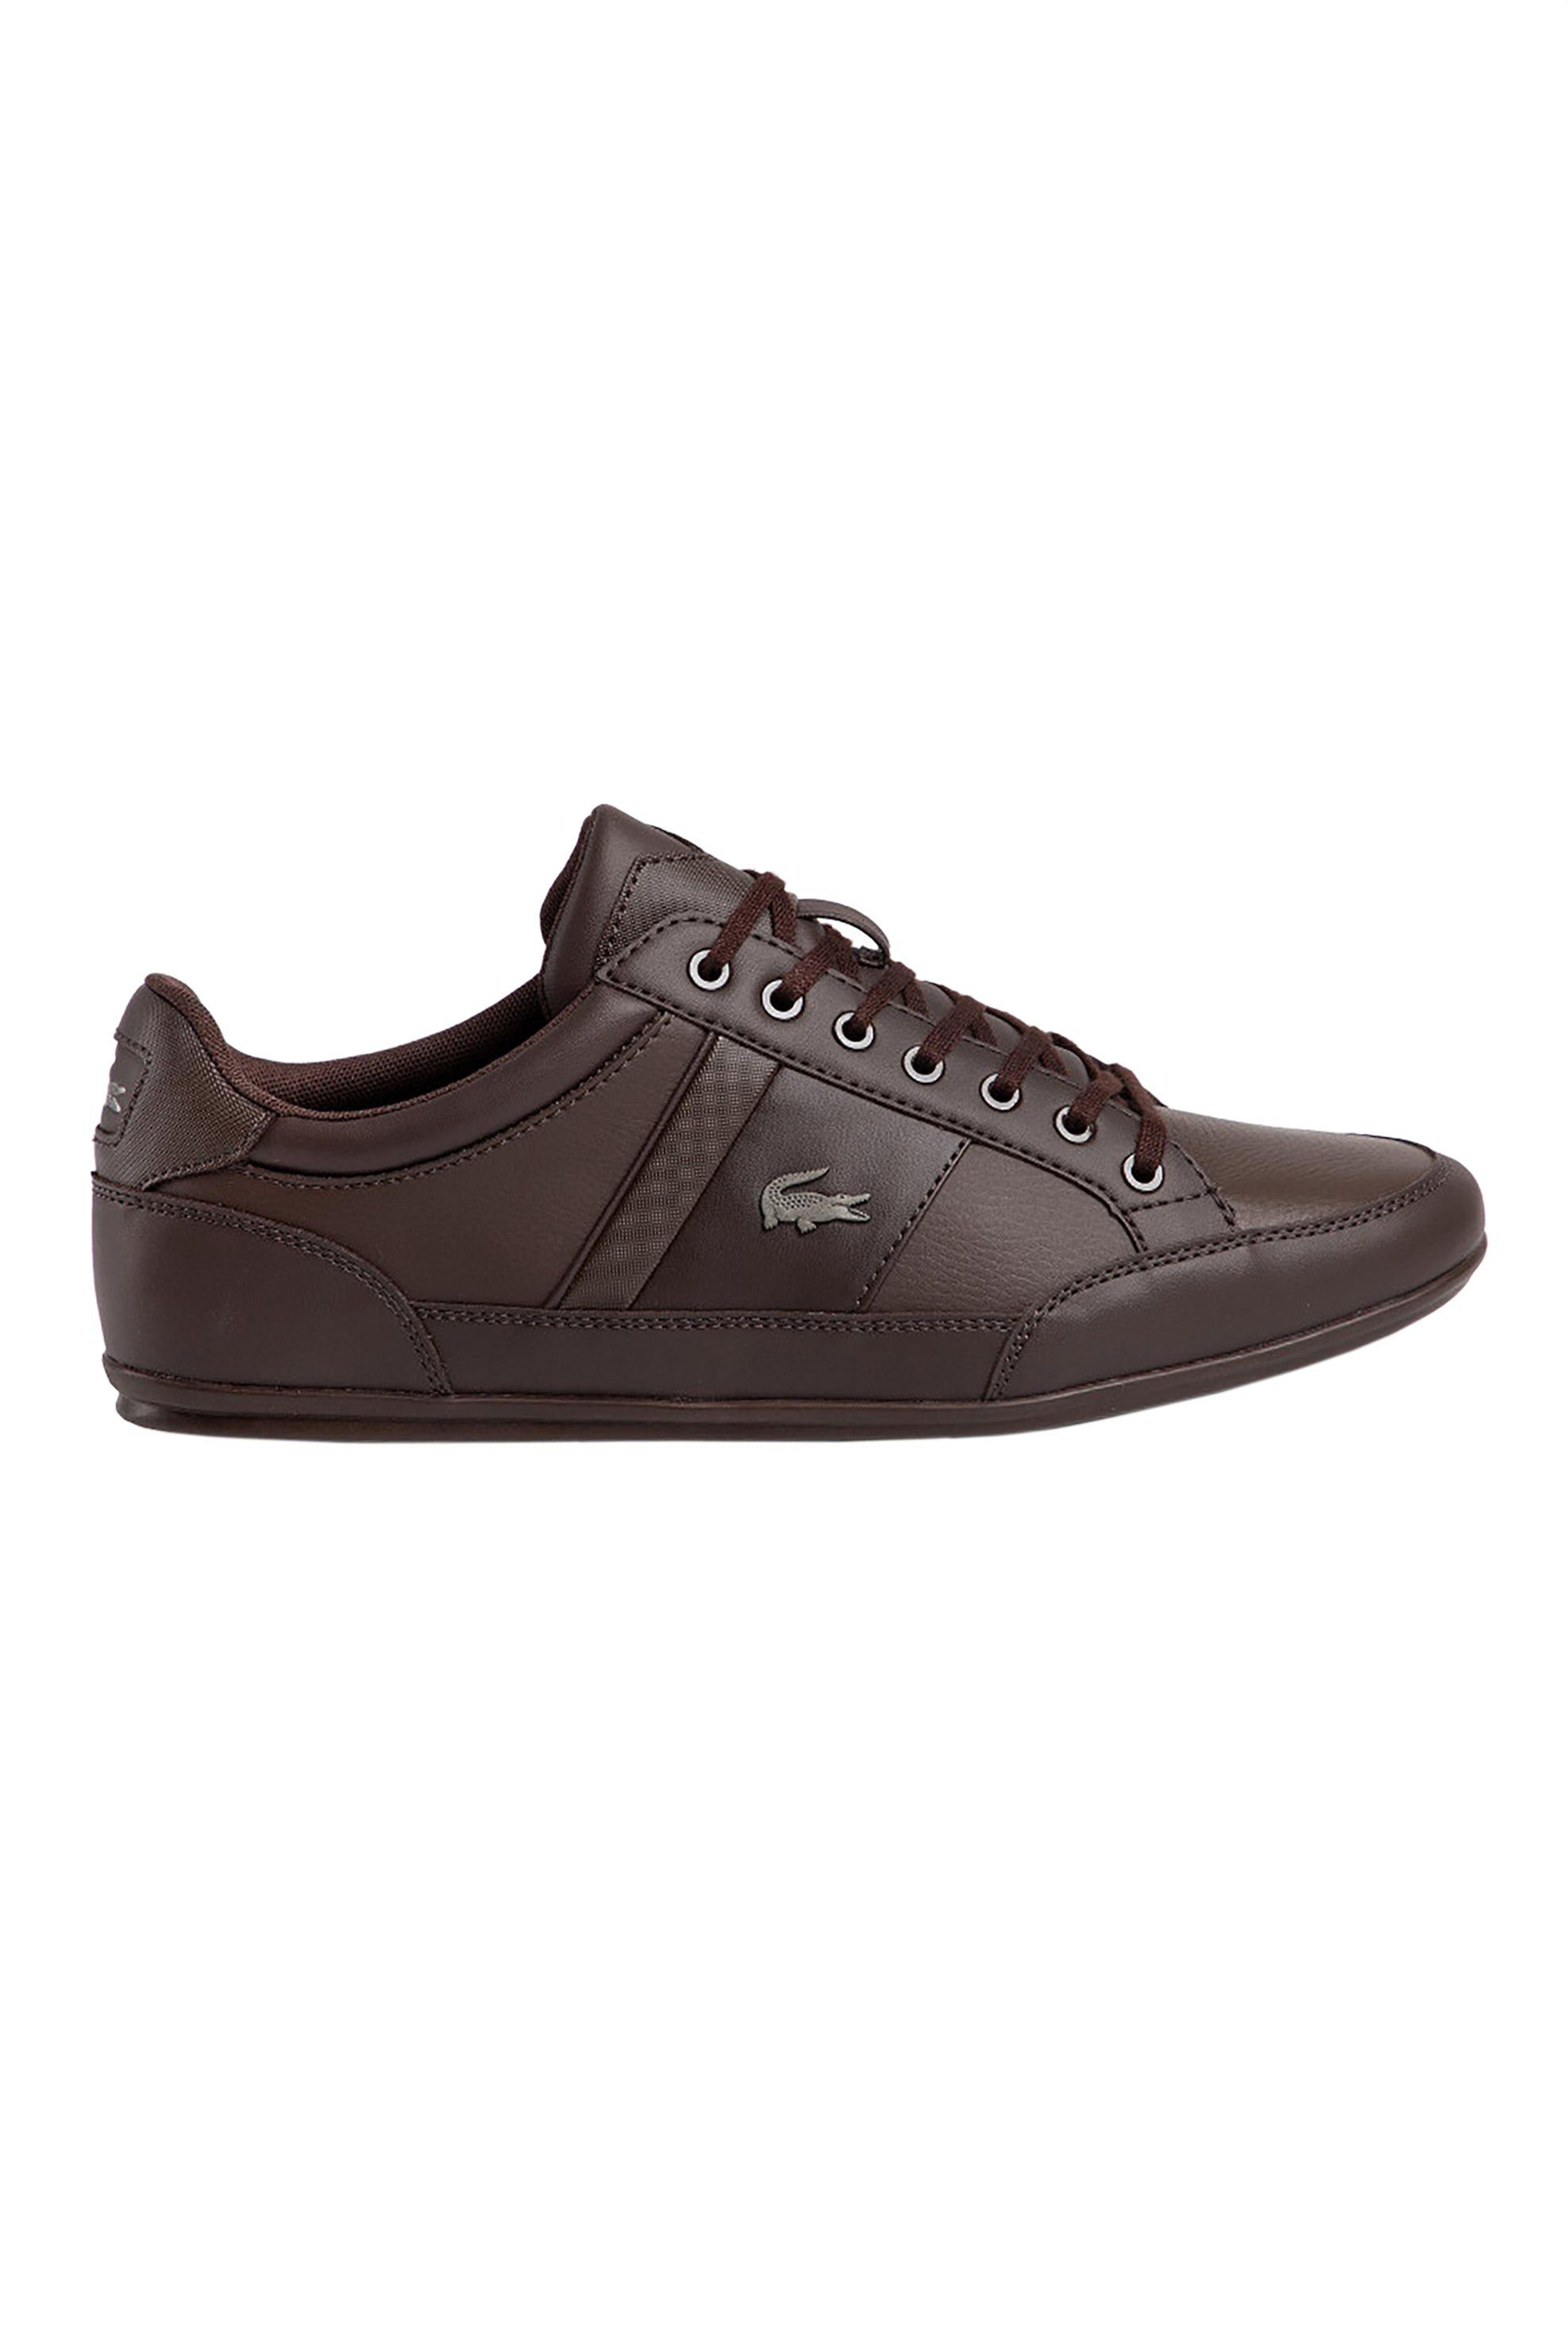 "Lacoste ανδρικά sneakers με μεταλλικό λογότυπο ""Chaymon BL 1"" – 37CMA0094DB2 – Καφέ"